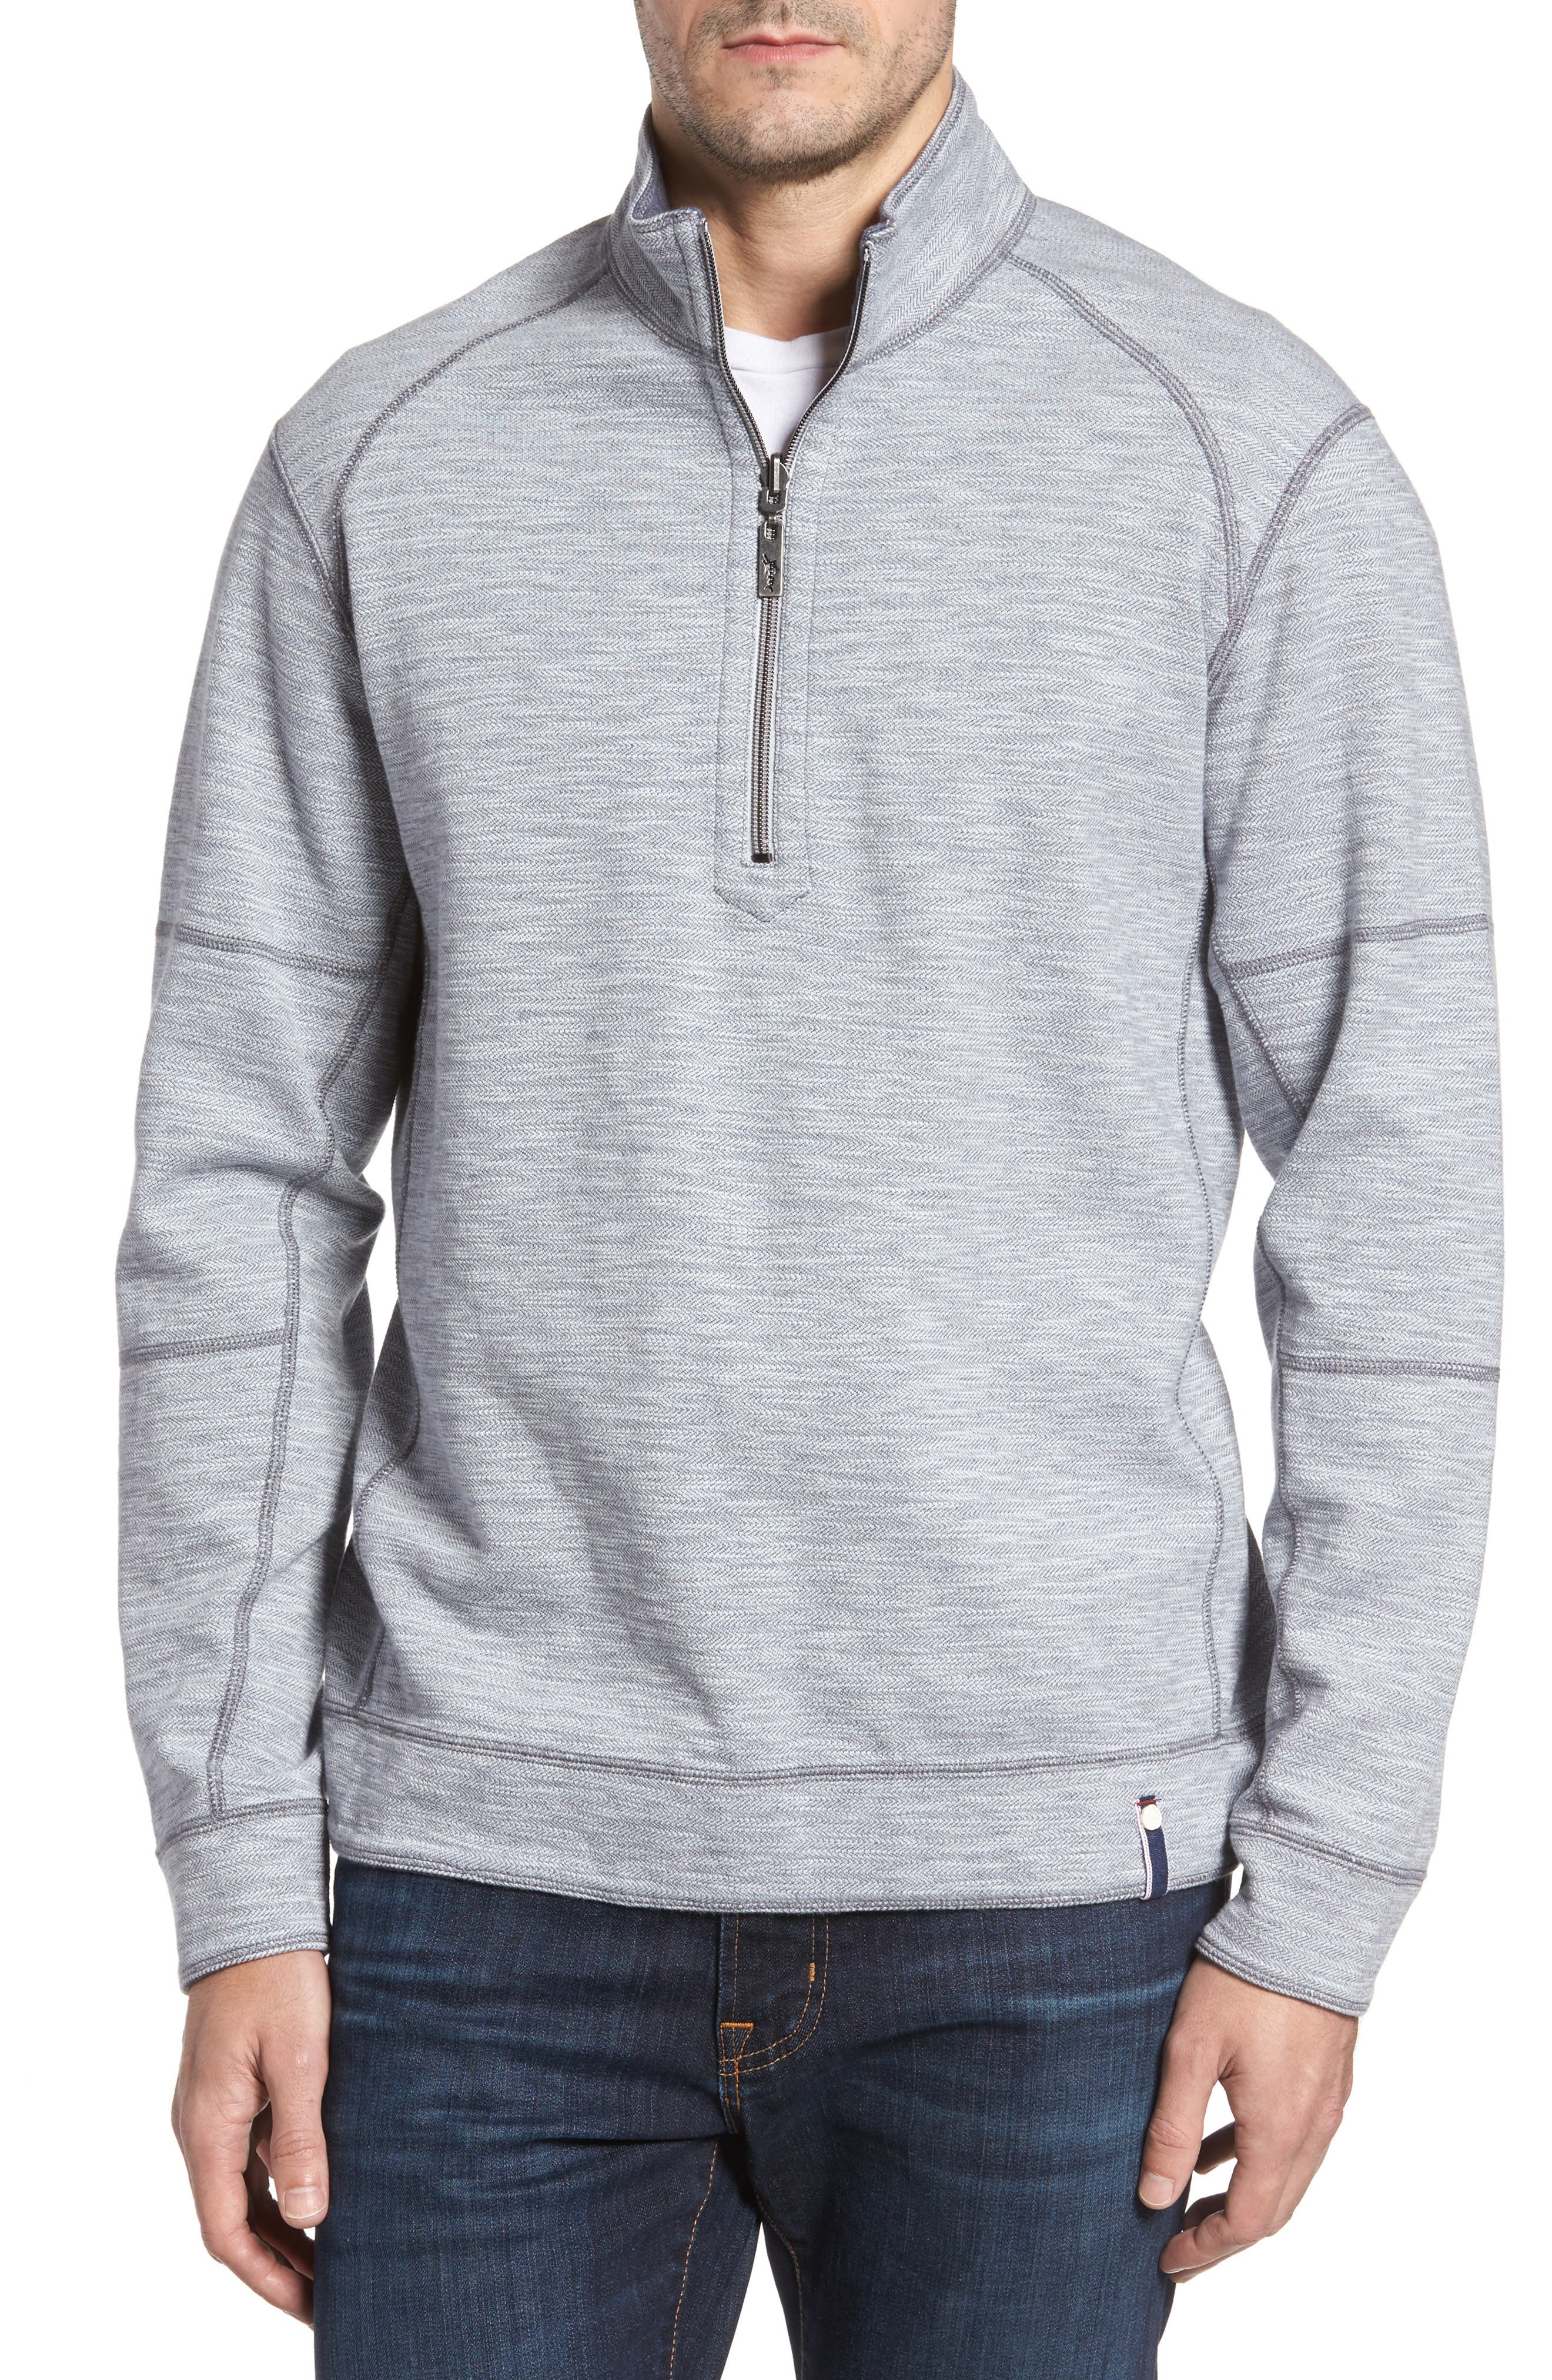 Alternate Image 1 Selected - Tommy Bahama Sandbar Slub Reversible Quarter Zip Pullover